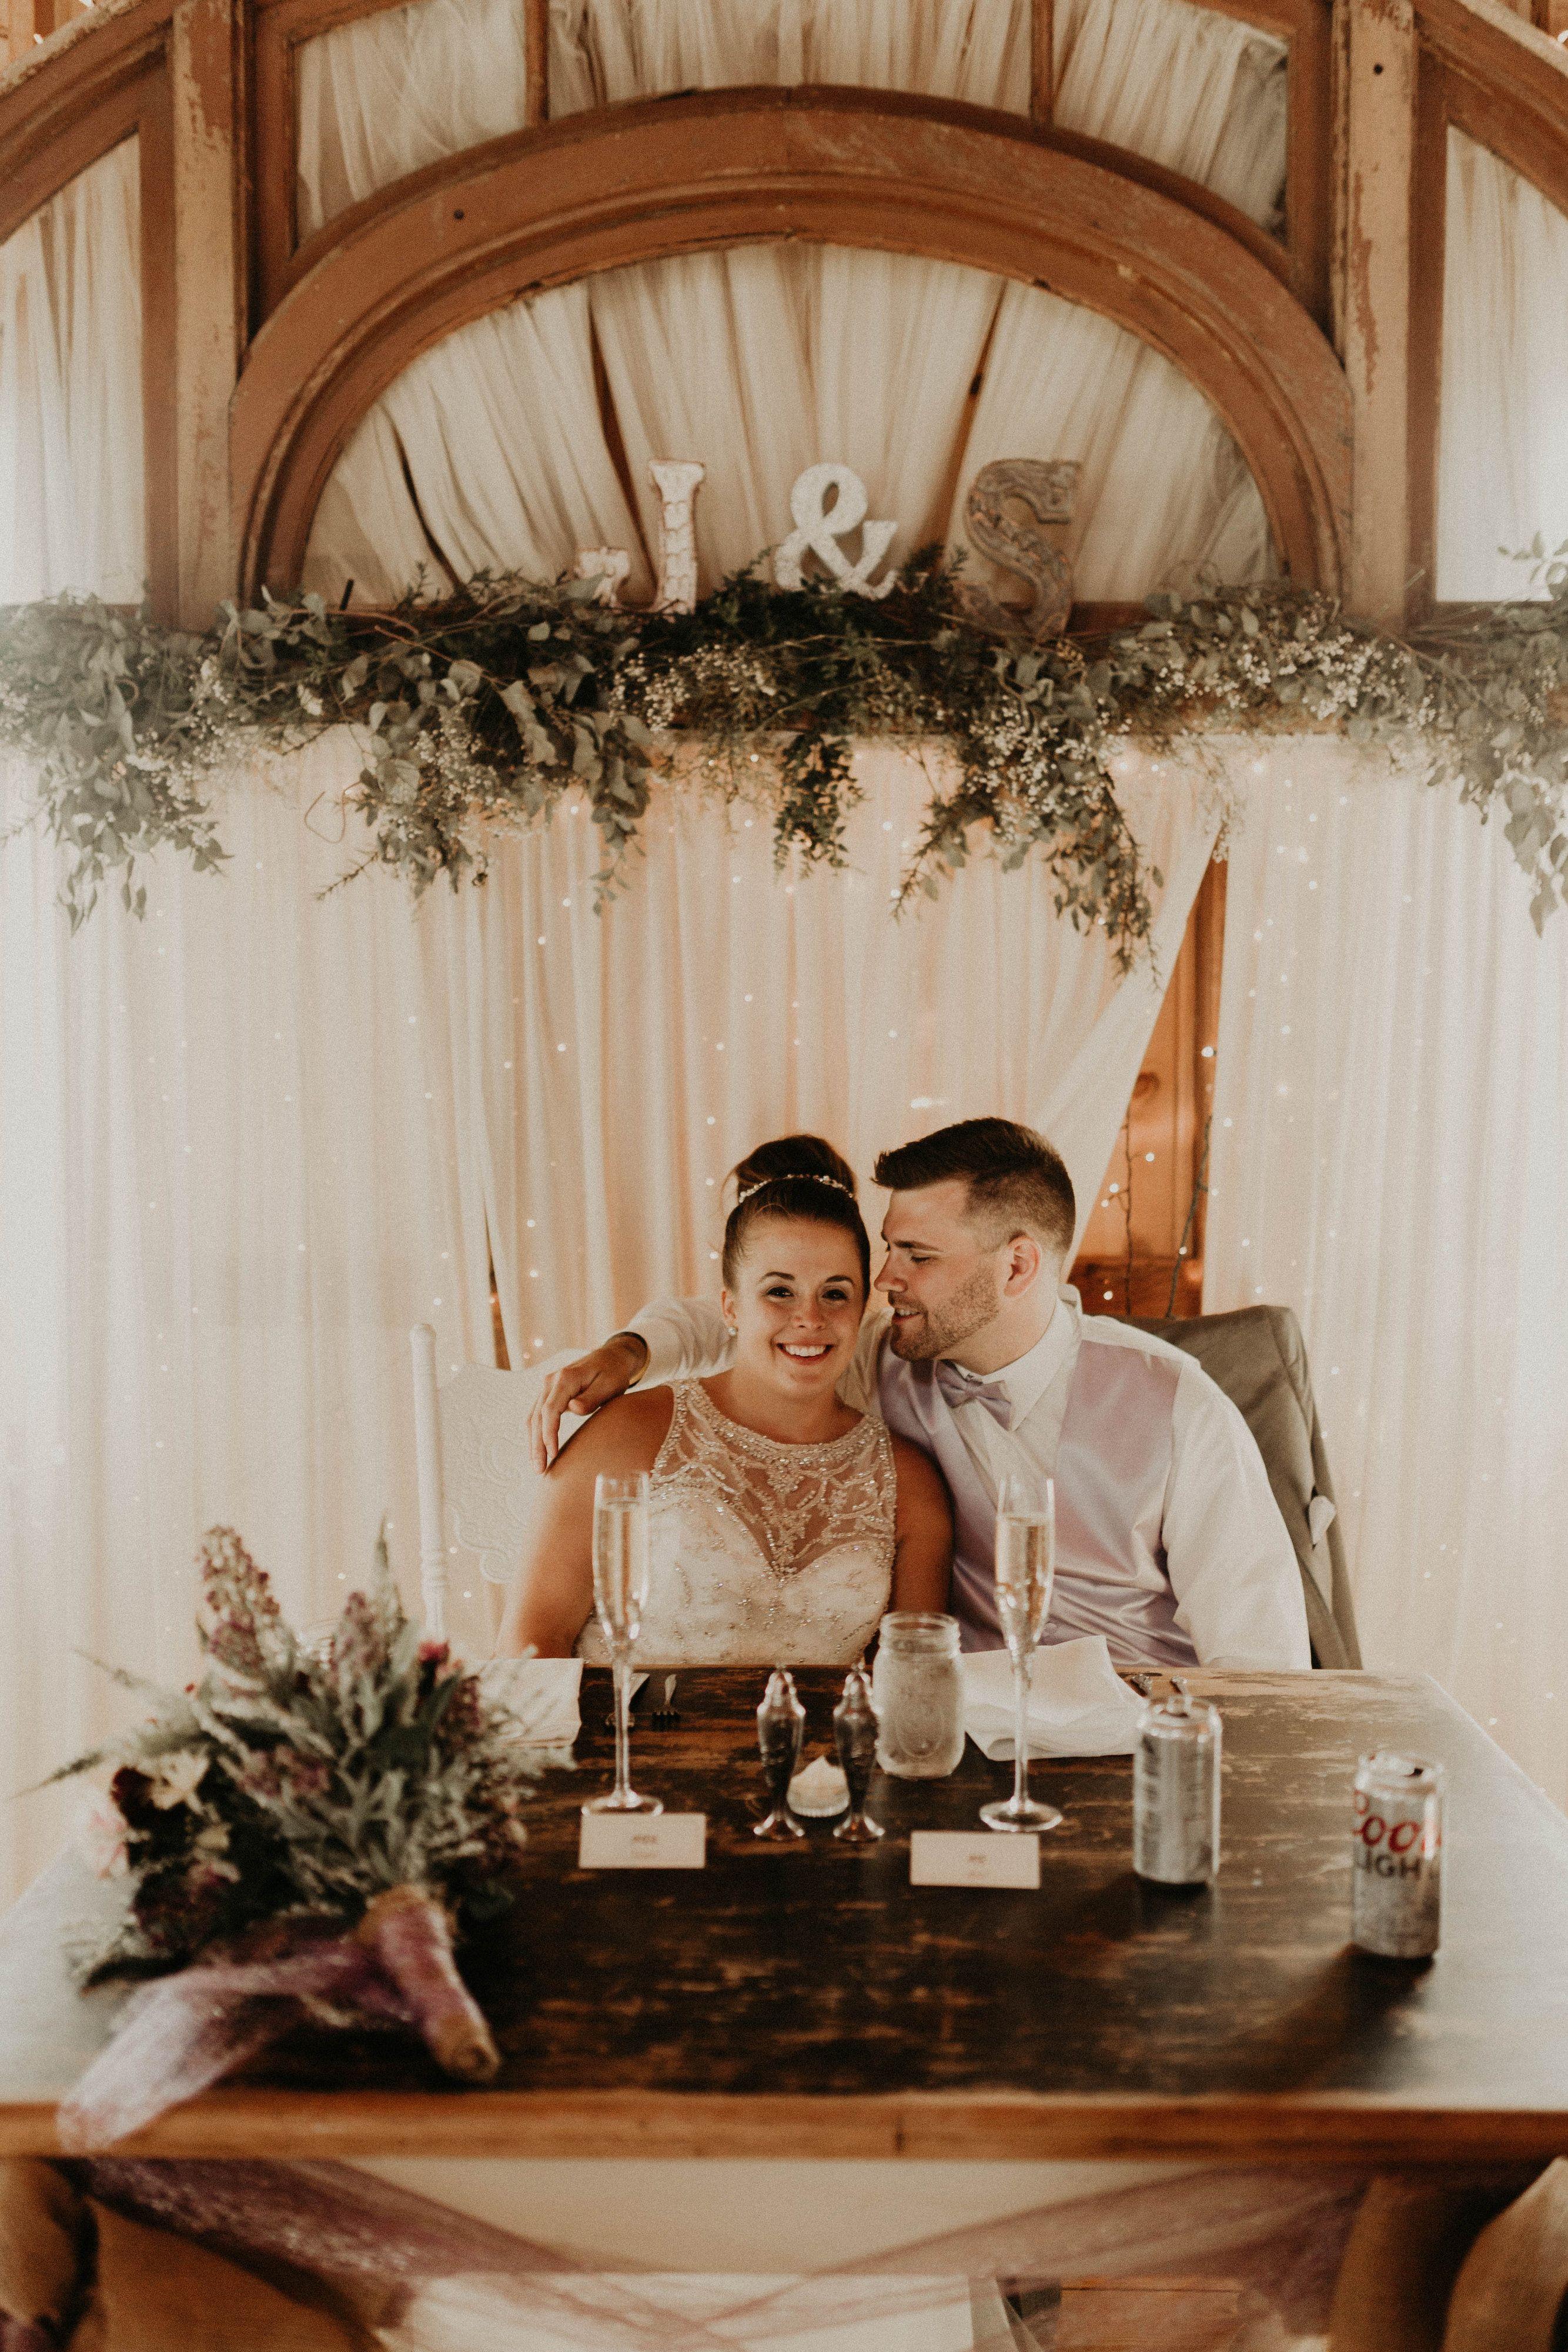 Rustic wedding in Northeast ohio Rustic wedding venues